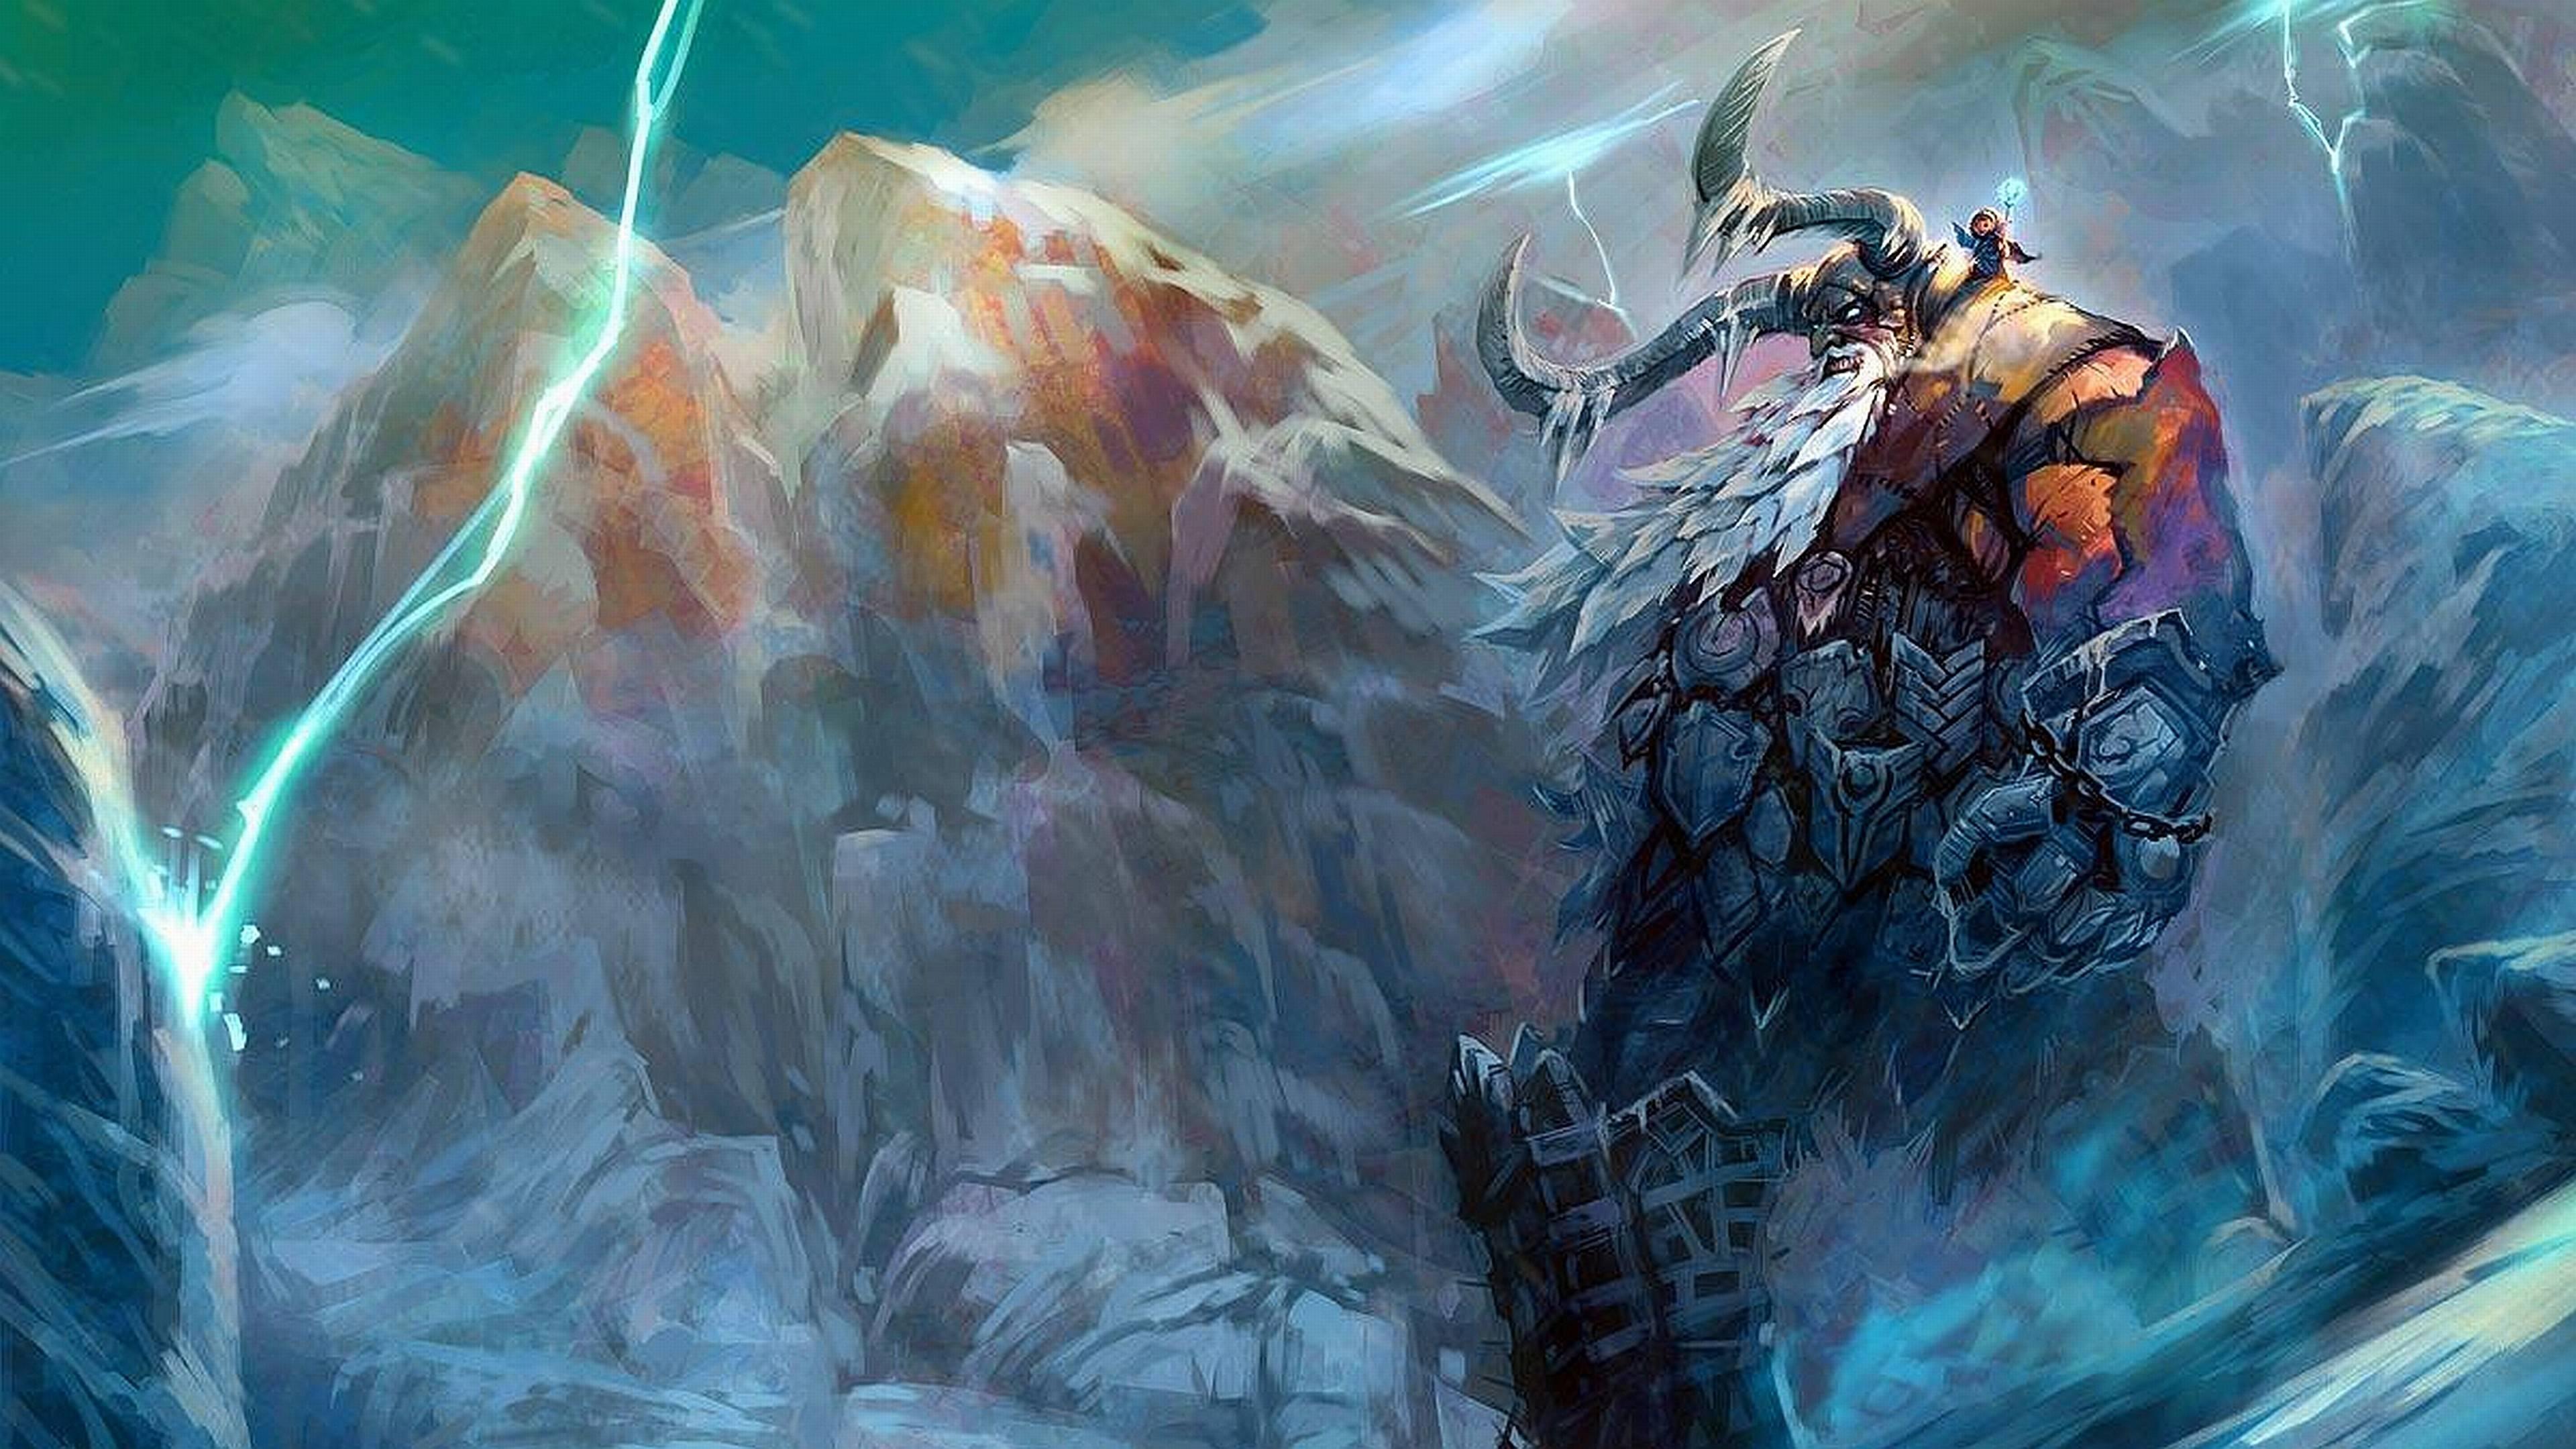 Warcraft mage dance 3 - 2 part 2